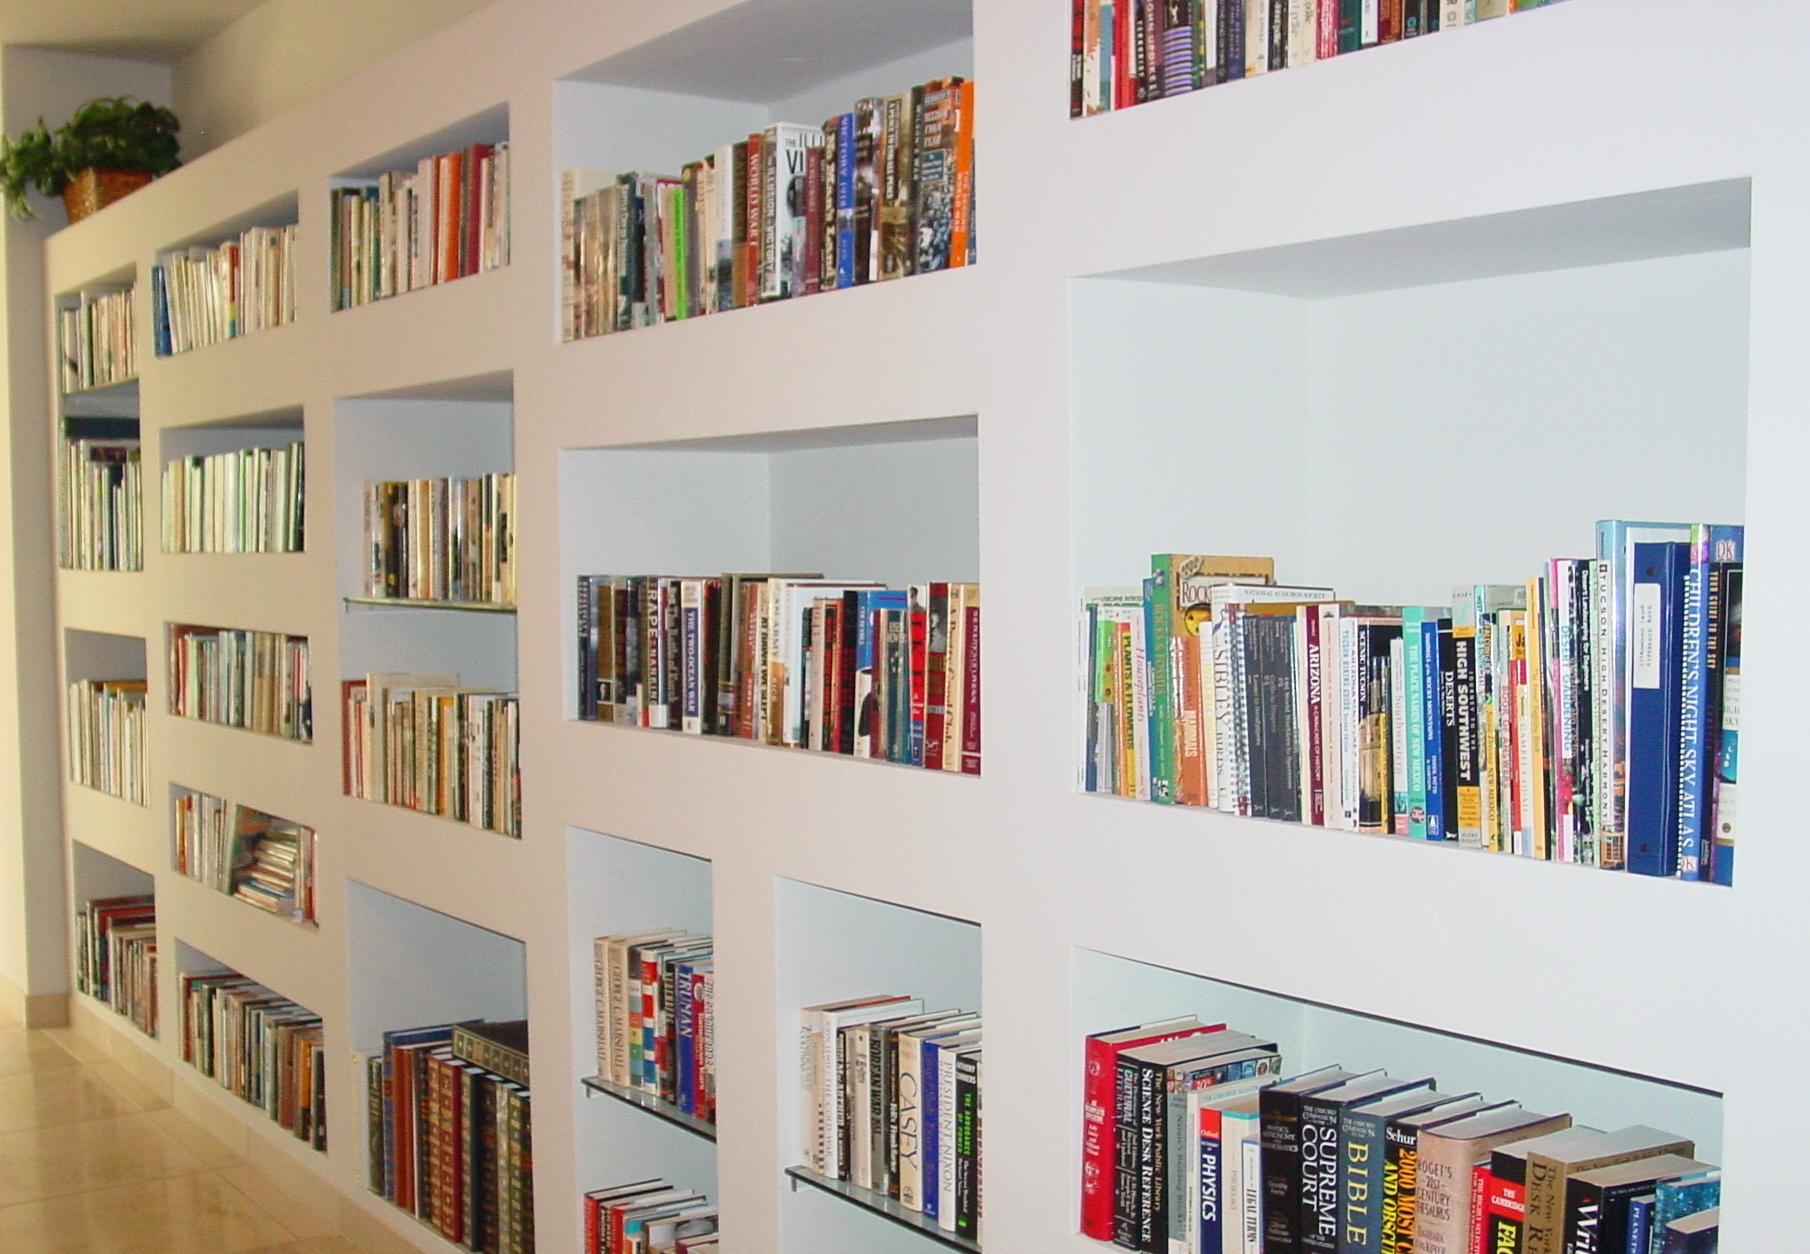 Built In Drywall Shelves Built In Bookcases Rhapsody In Books Weblog